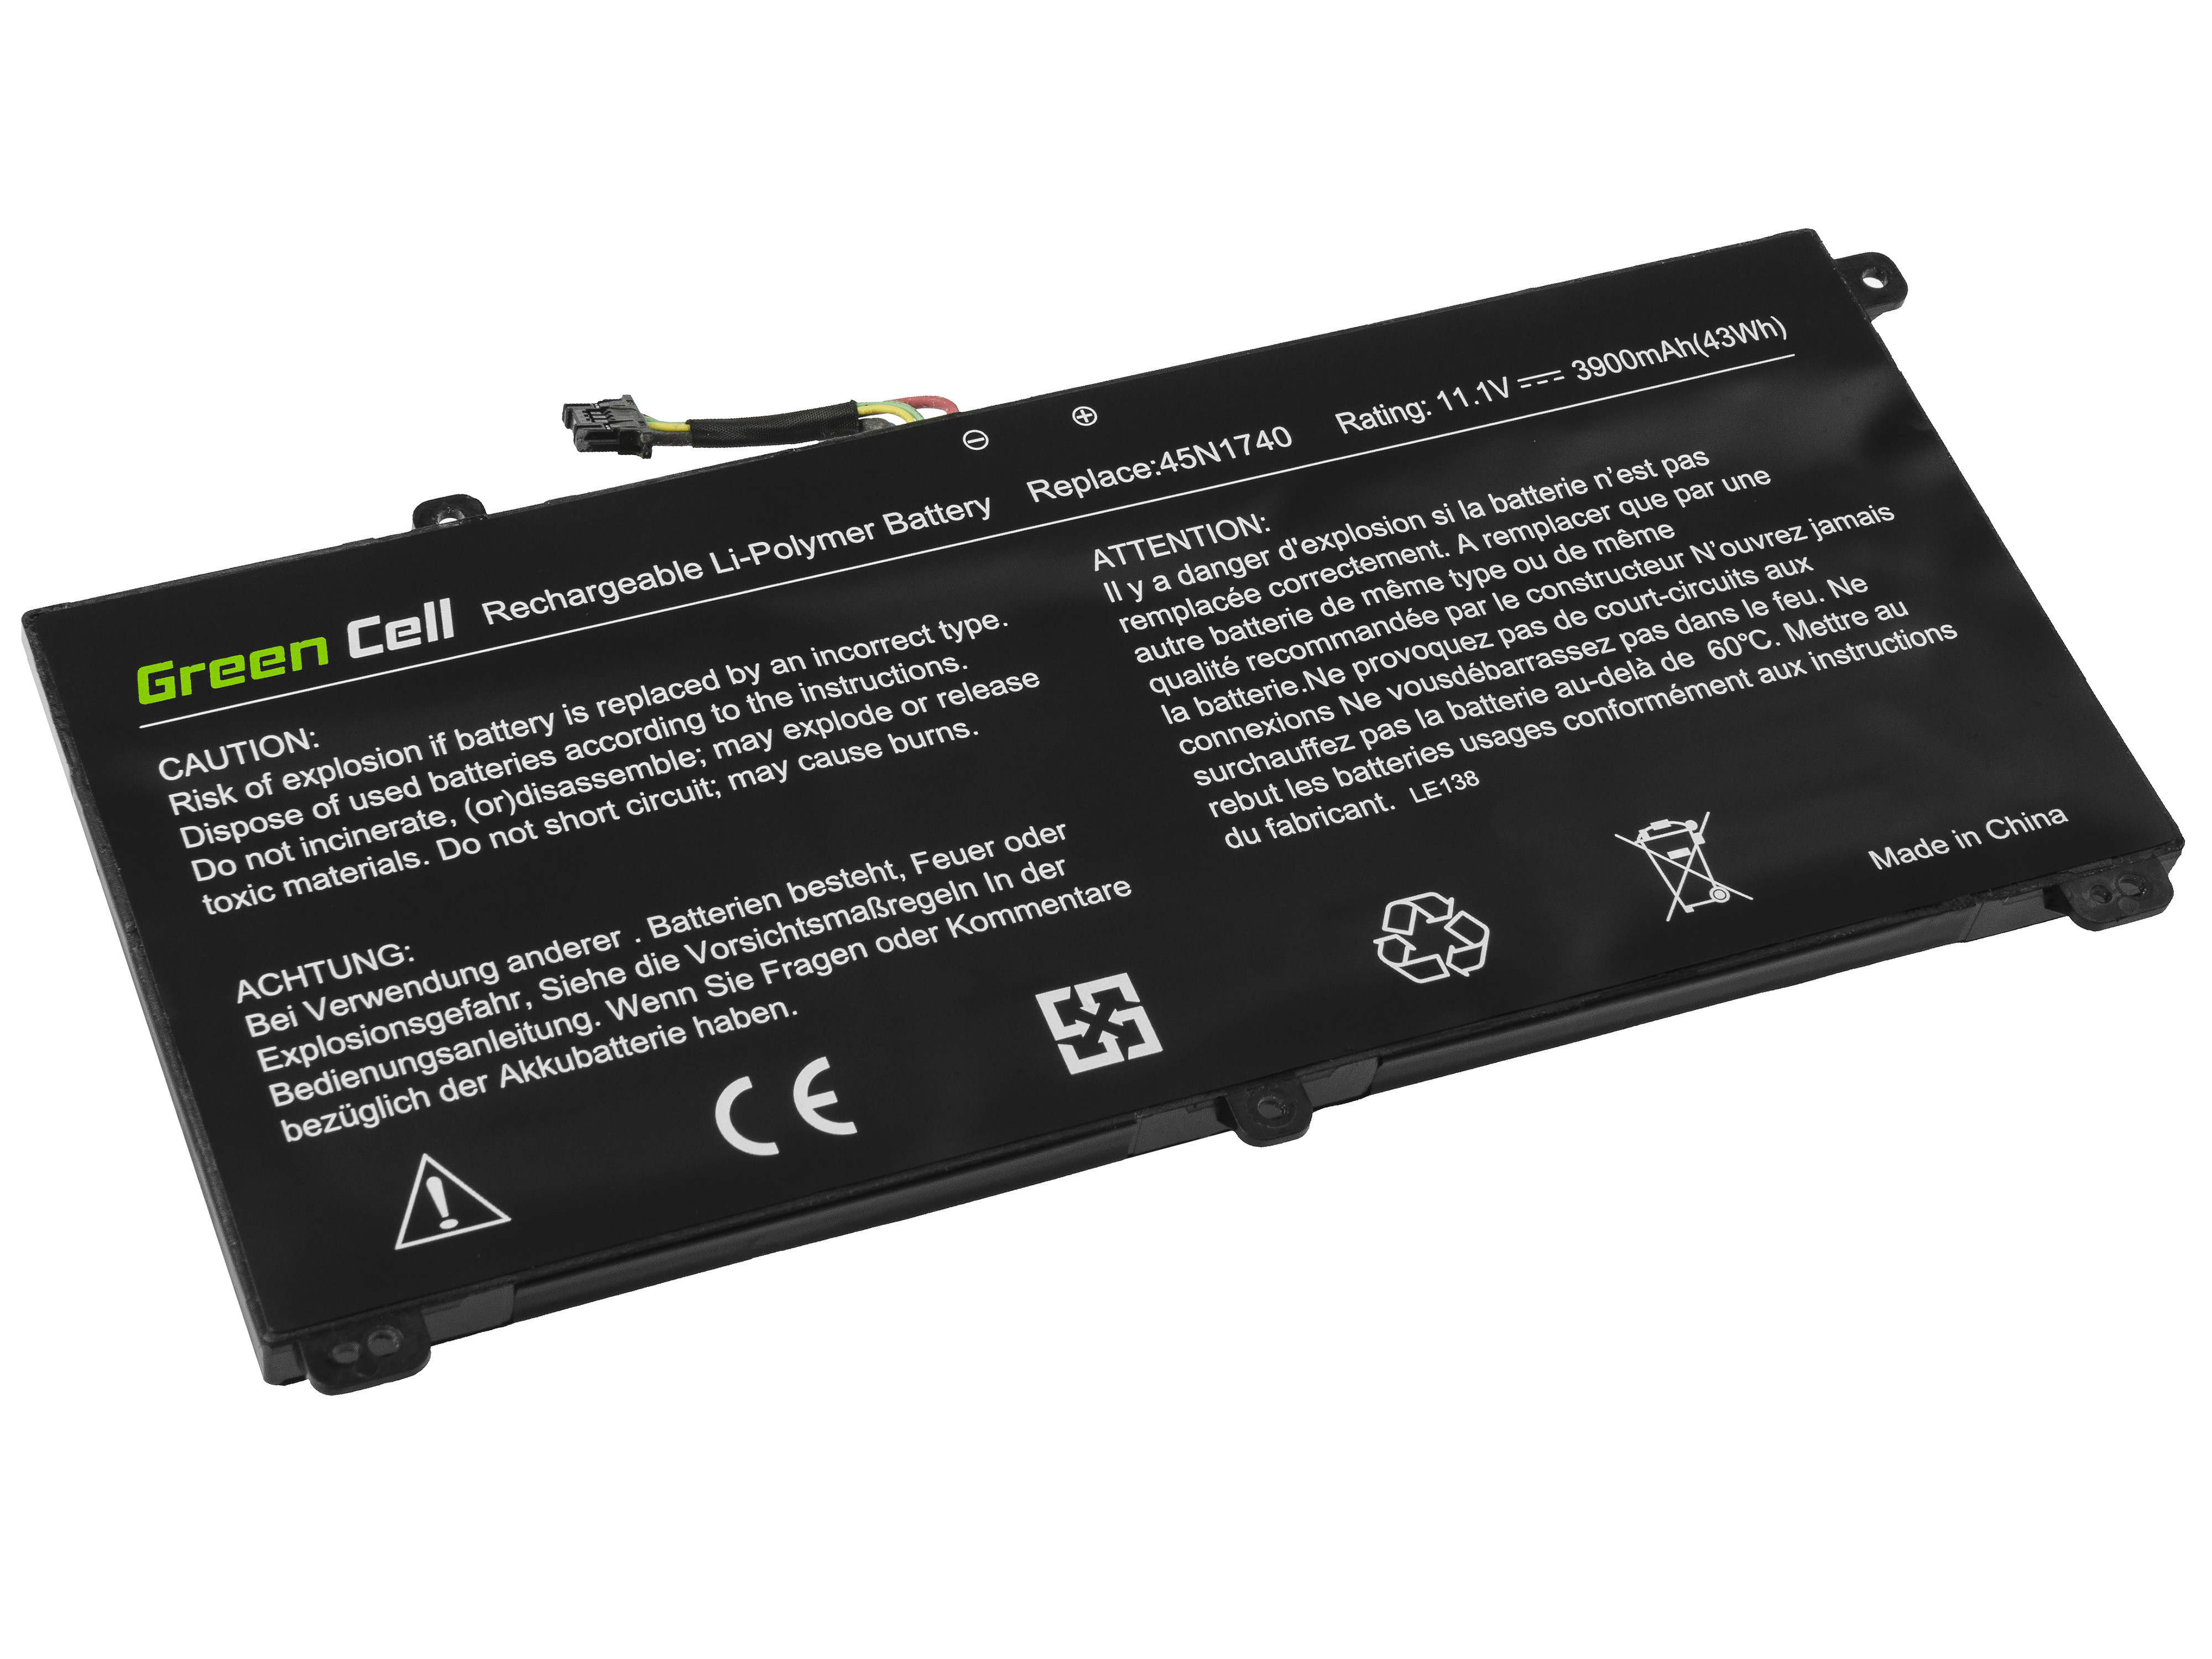 Green Cell LE138 Baterie Lenovo 45N1740,45N1741 pro Lenovo ThinkPad T550 T560 W550s P50s 3900mAh Li-Pol – neoriginální